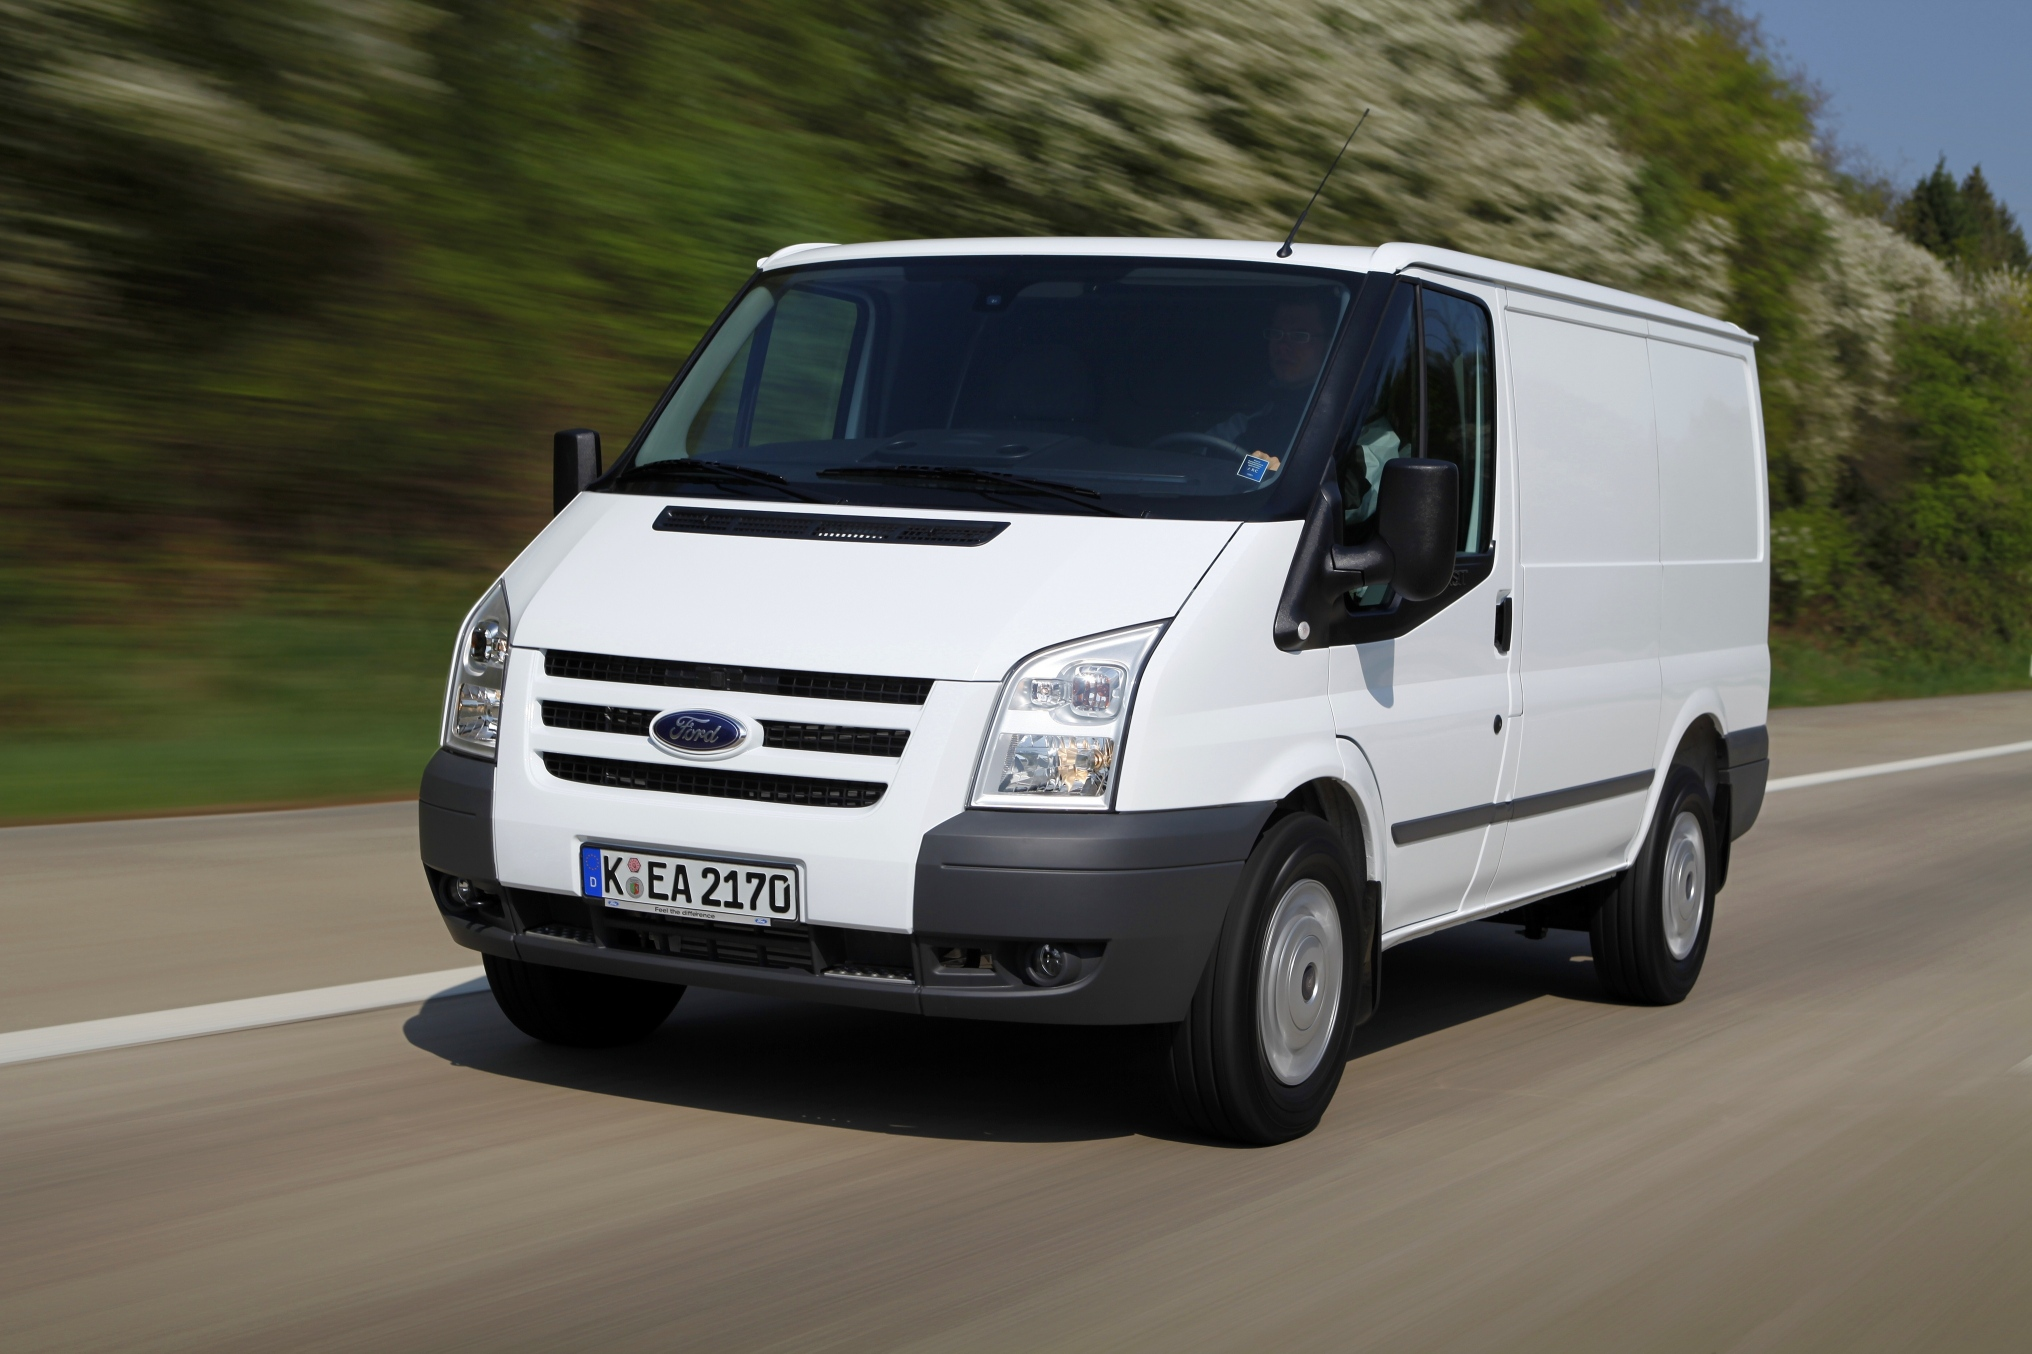 Ford Transit стал лучшим по продажам в сегменте LCV среди иномарок